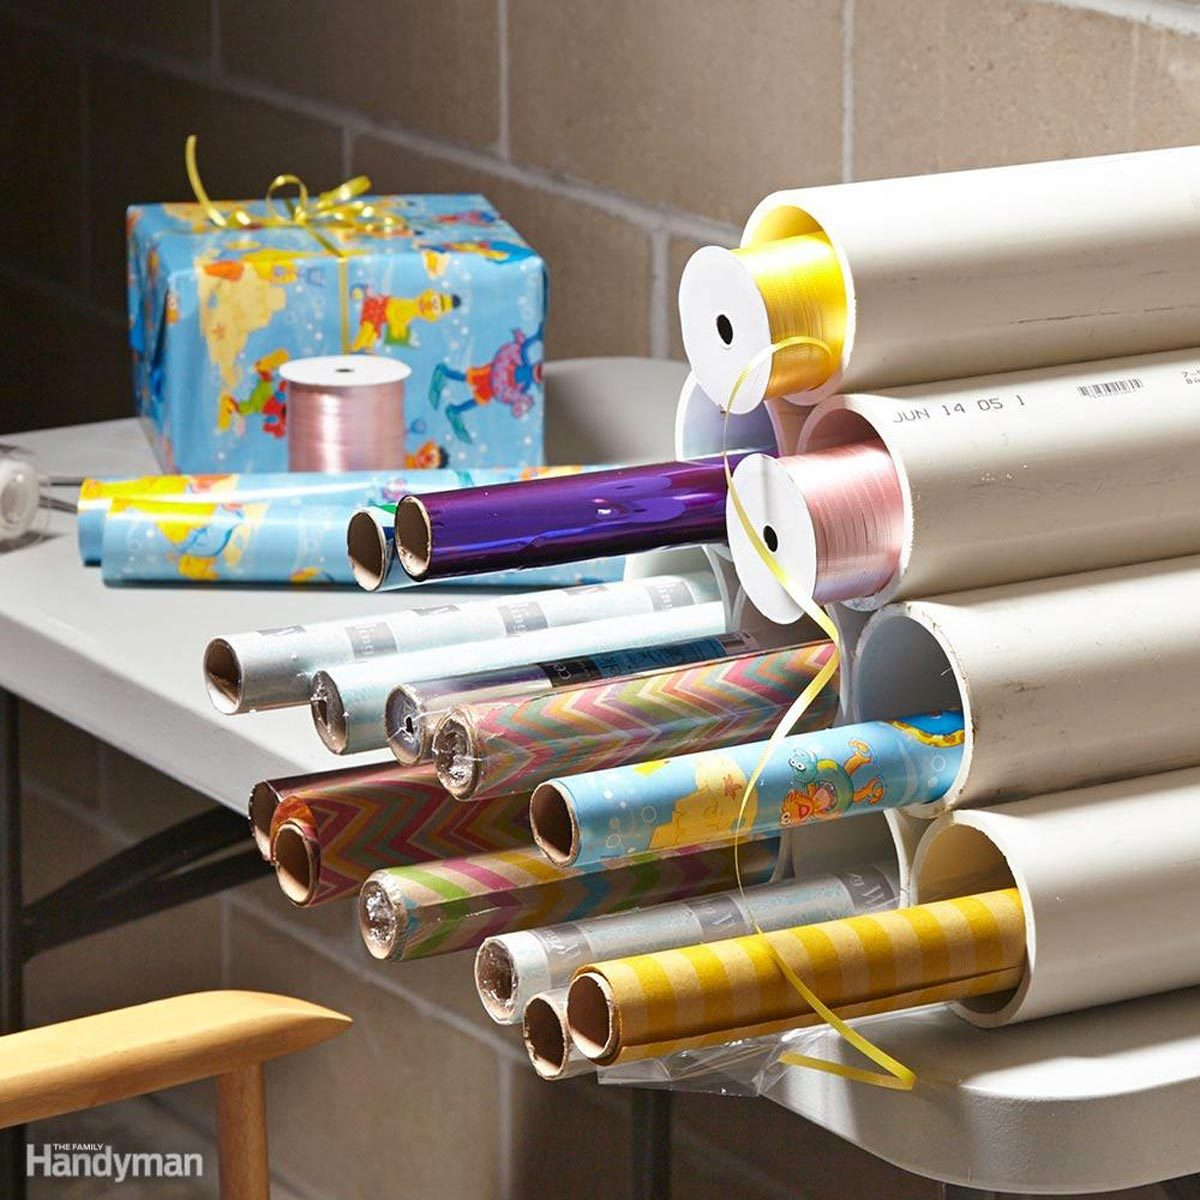 Organize Gift Wrap, Ribbons